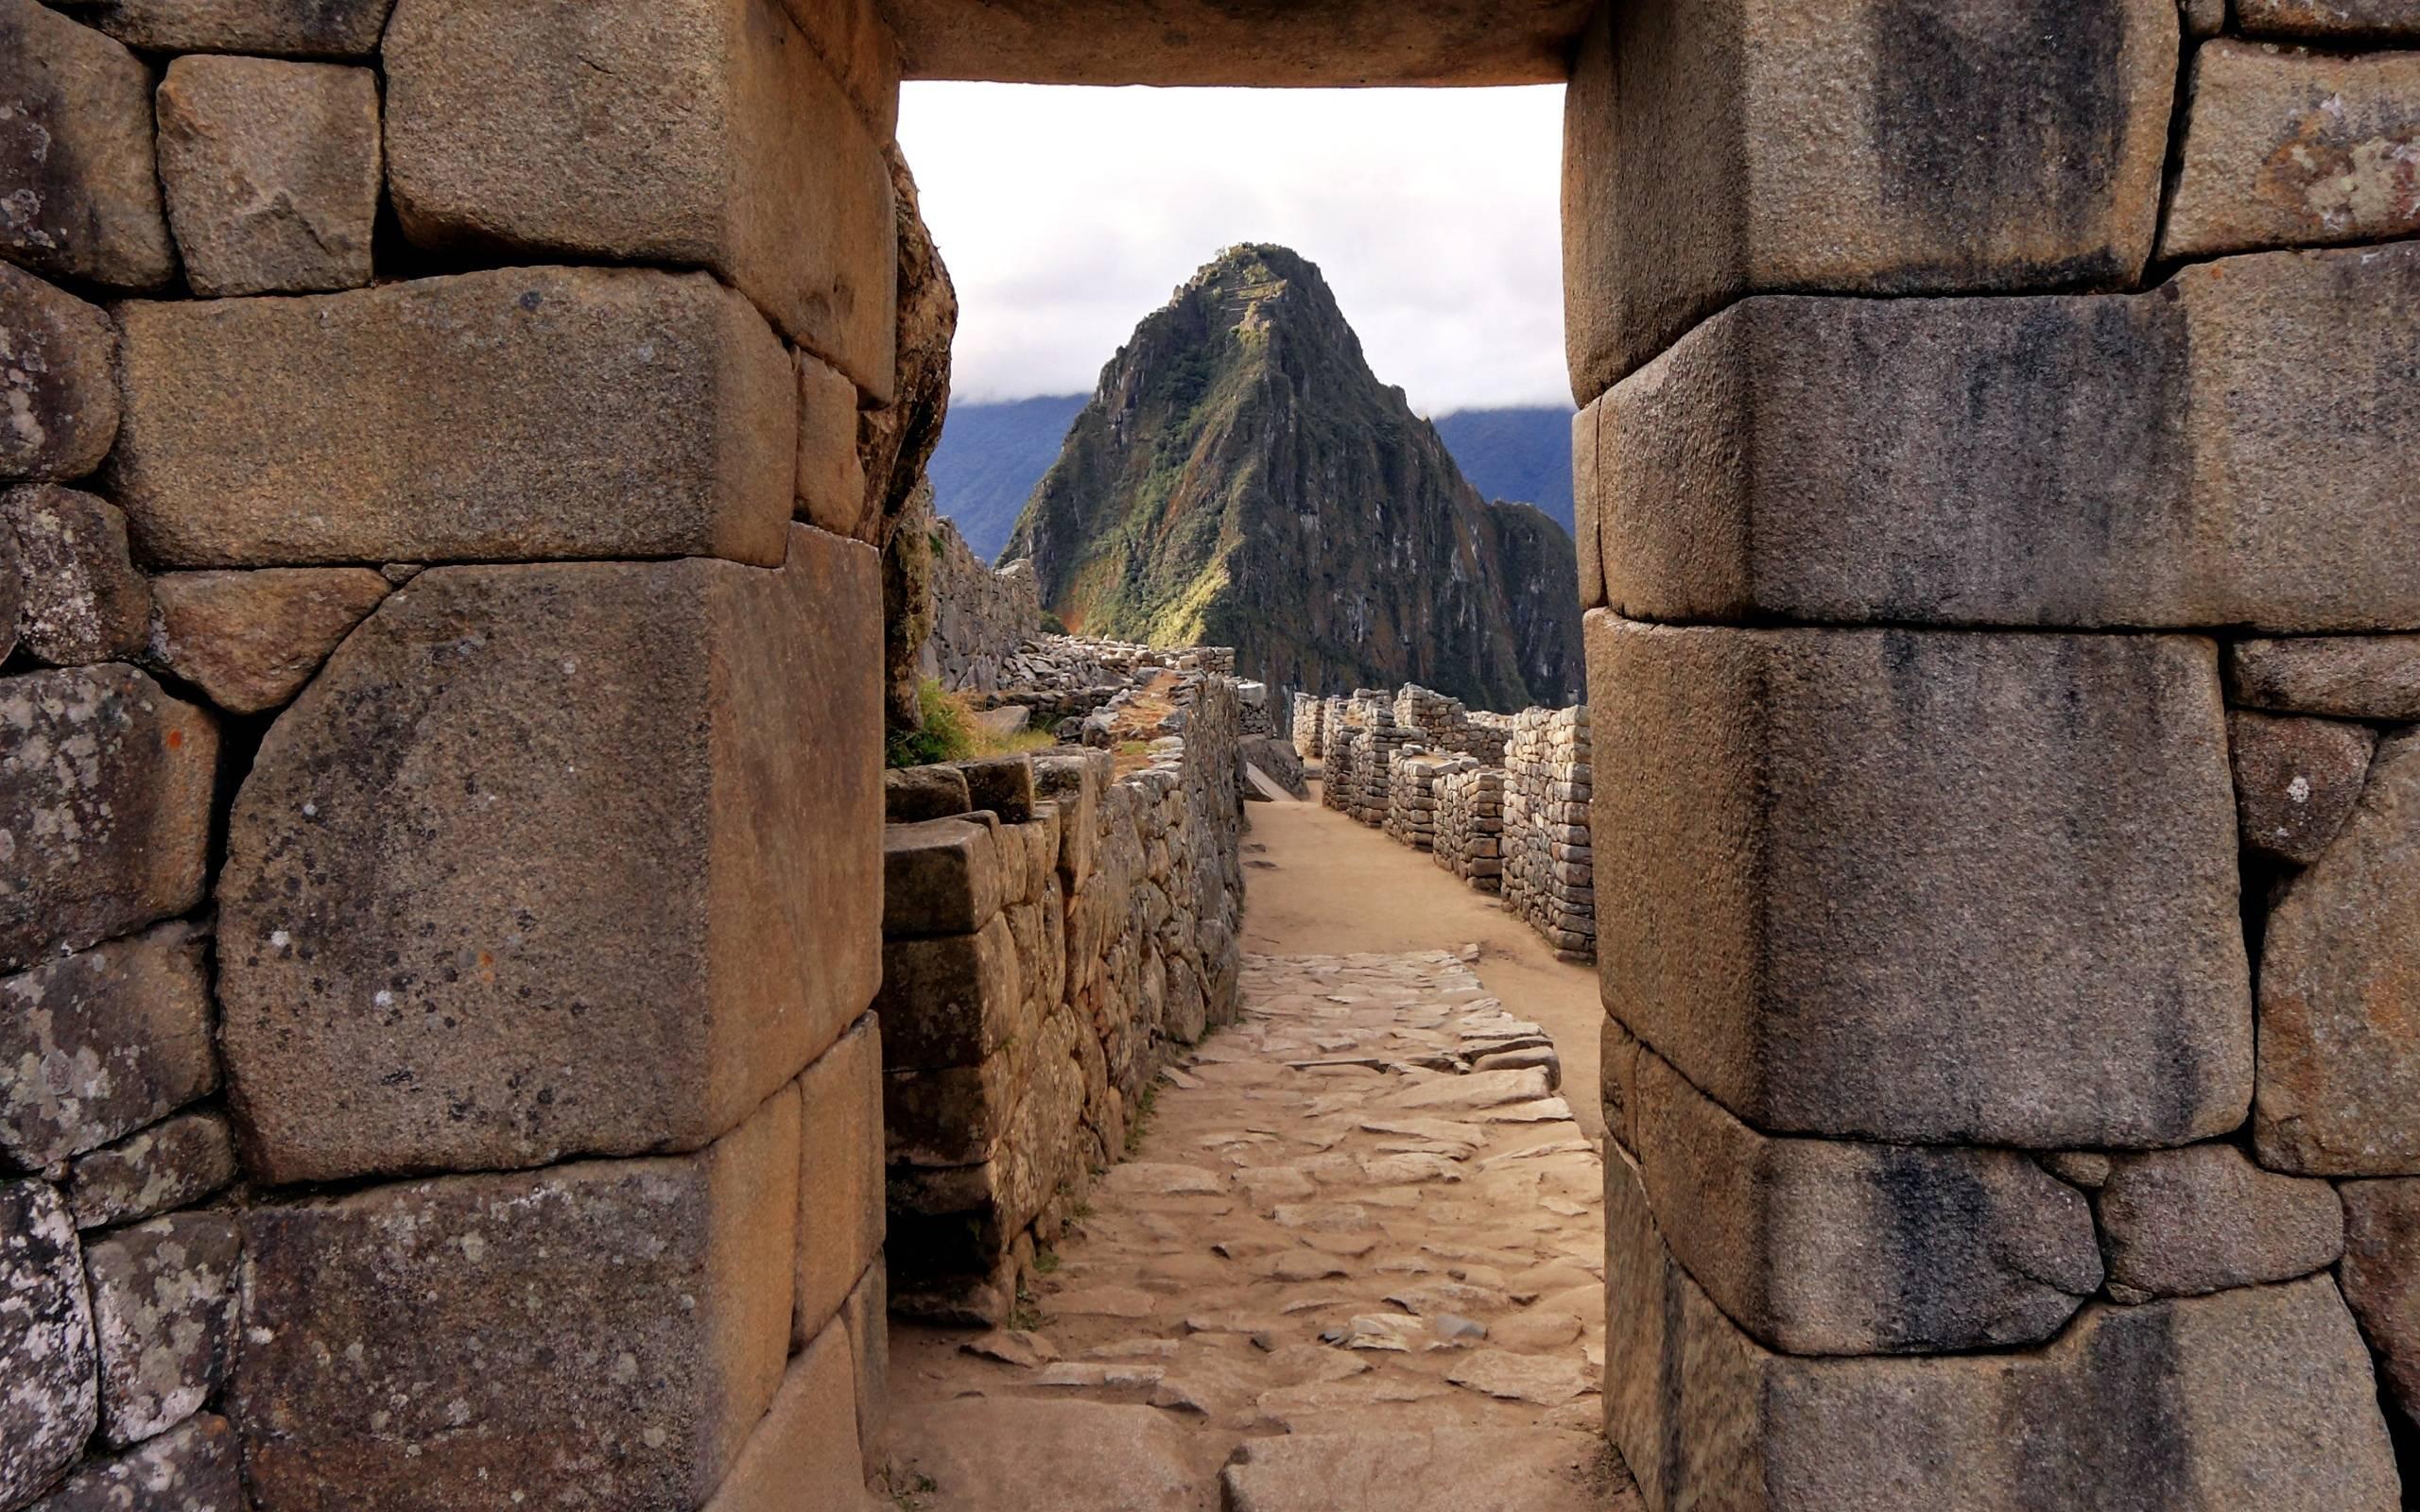 A look inside the walls of Machu Picchu